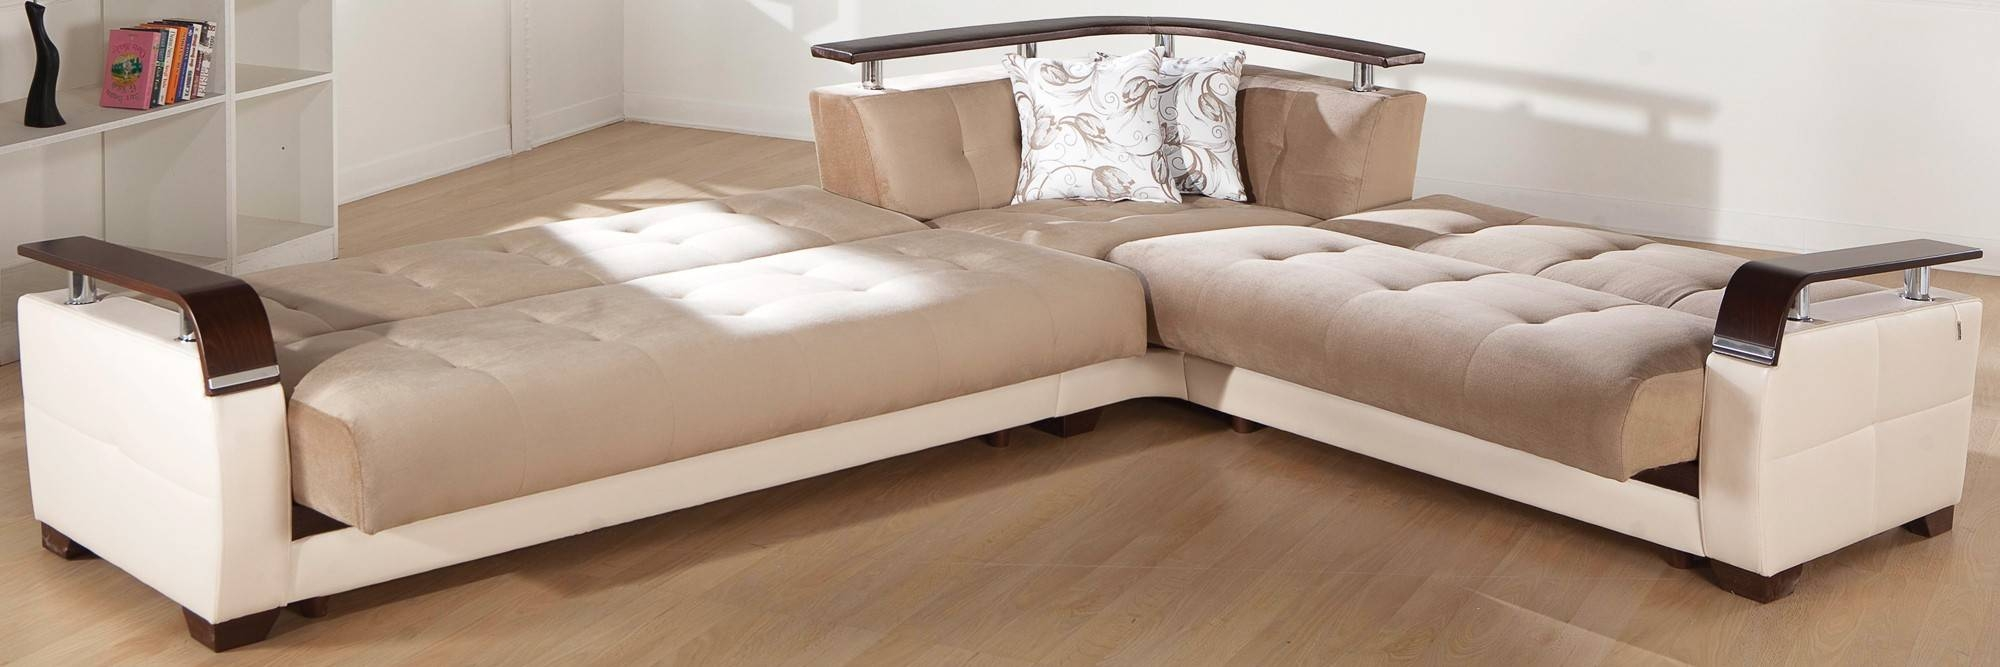 Sofas Center : Sofa Sleeper Sectional Cado Modern Furniture Vision with regard to Modern Sofas Houston (Image 26 of 30)